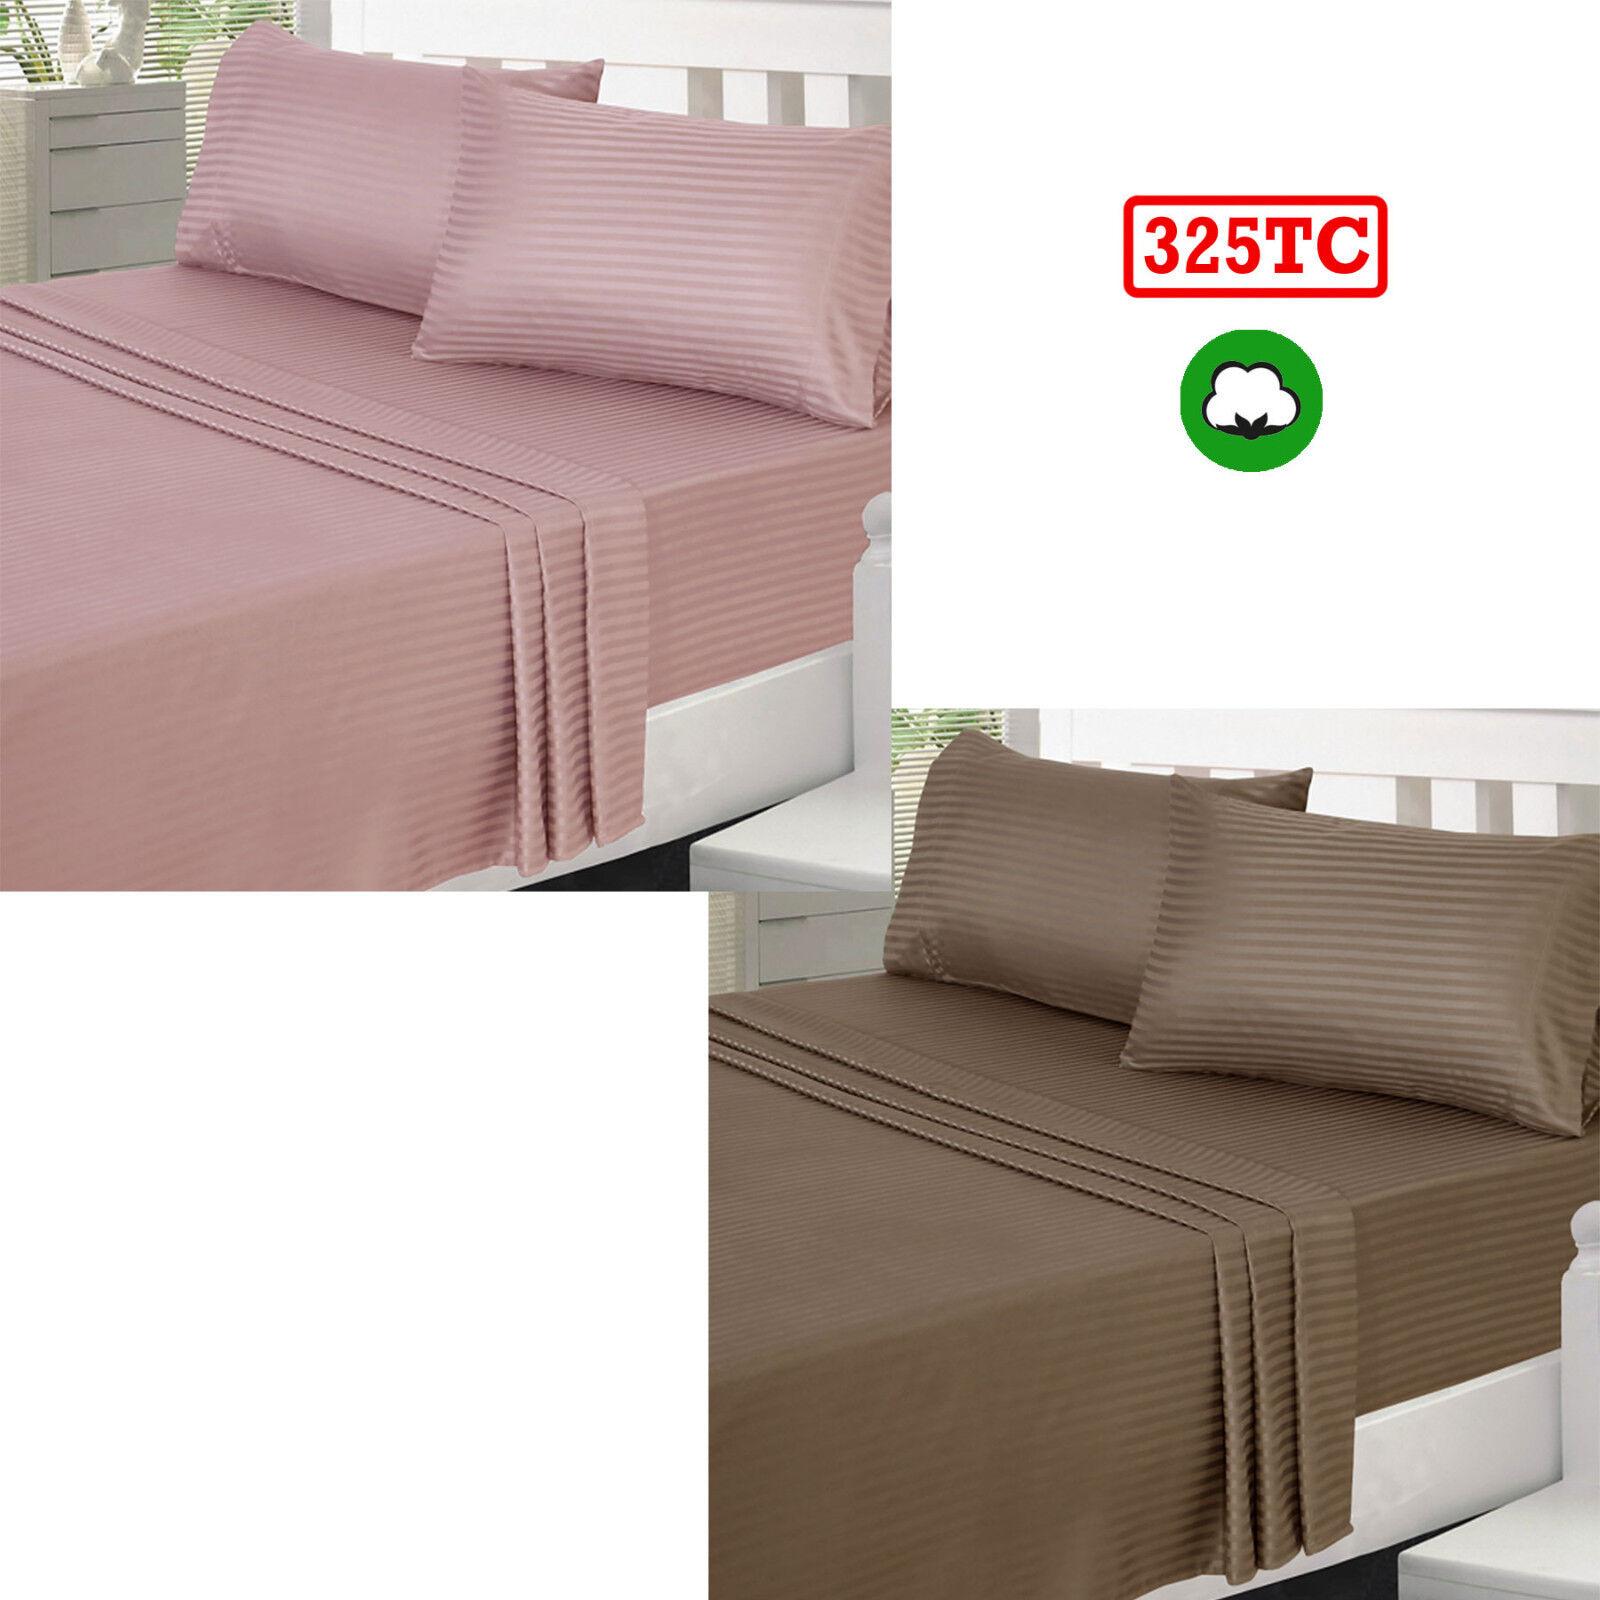 Blaush or Mocha Choice - 4 Pce 325TC Quality Cotton Striped Sheet Set KING Größe